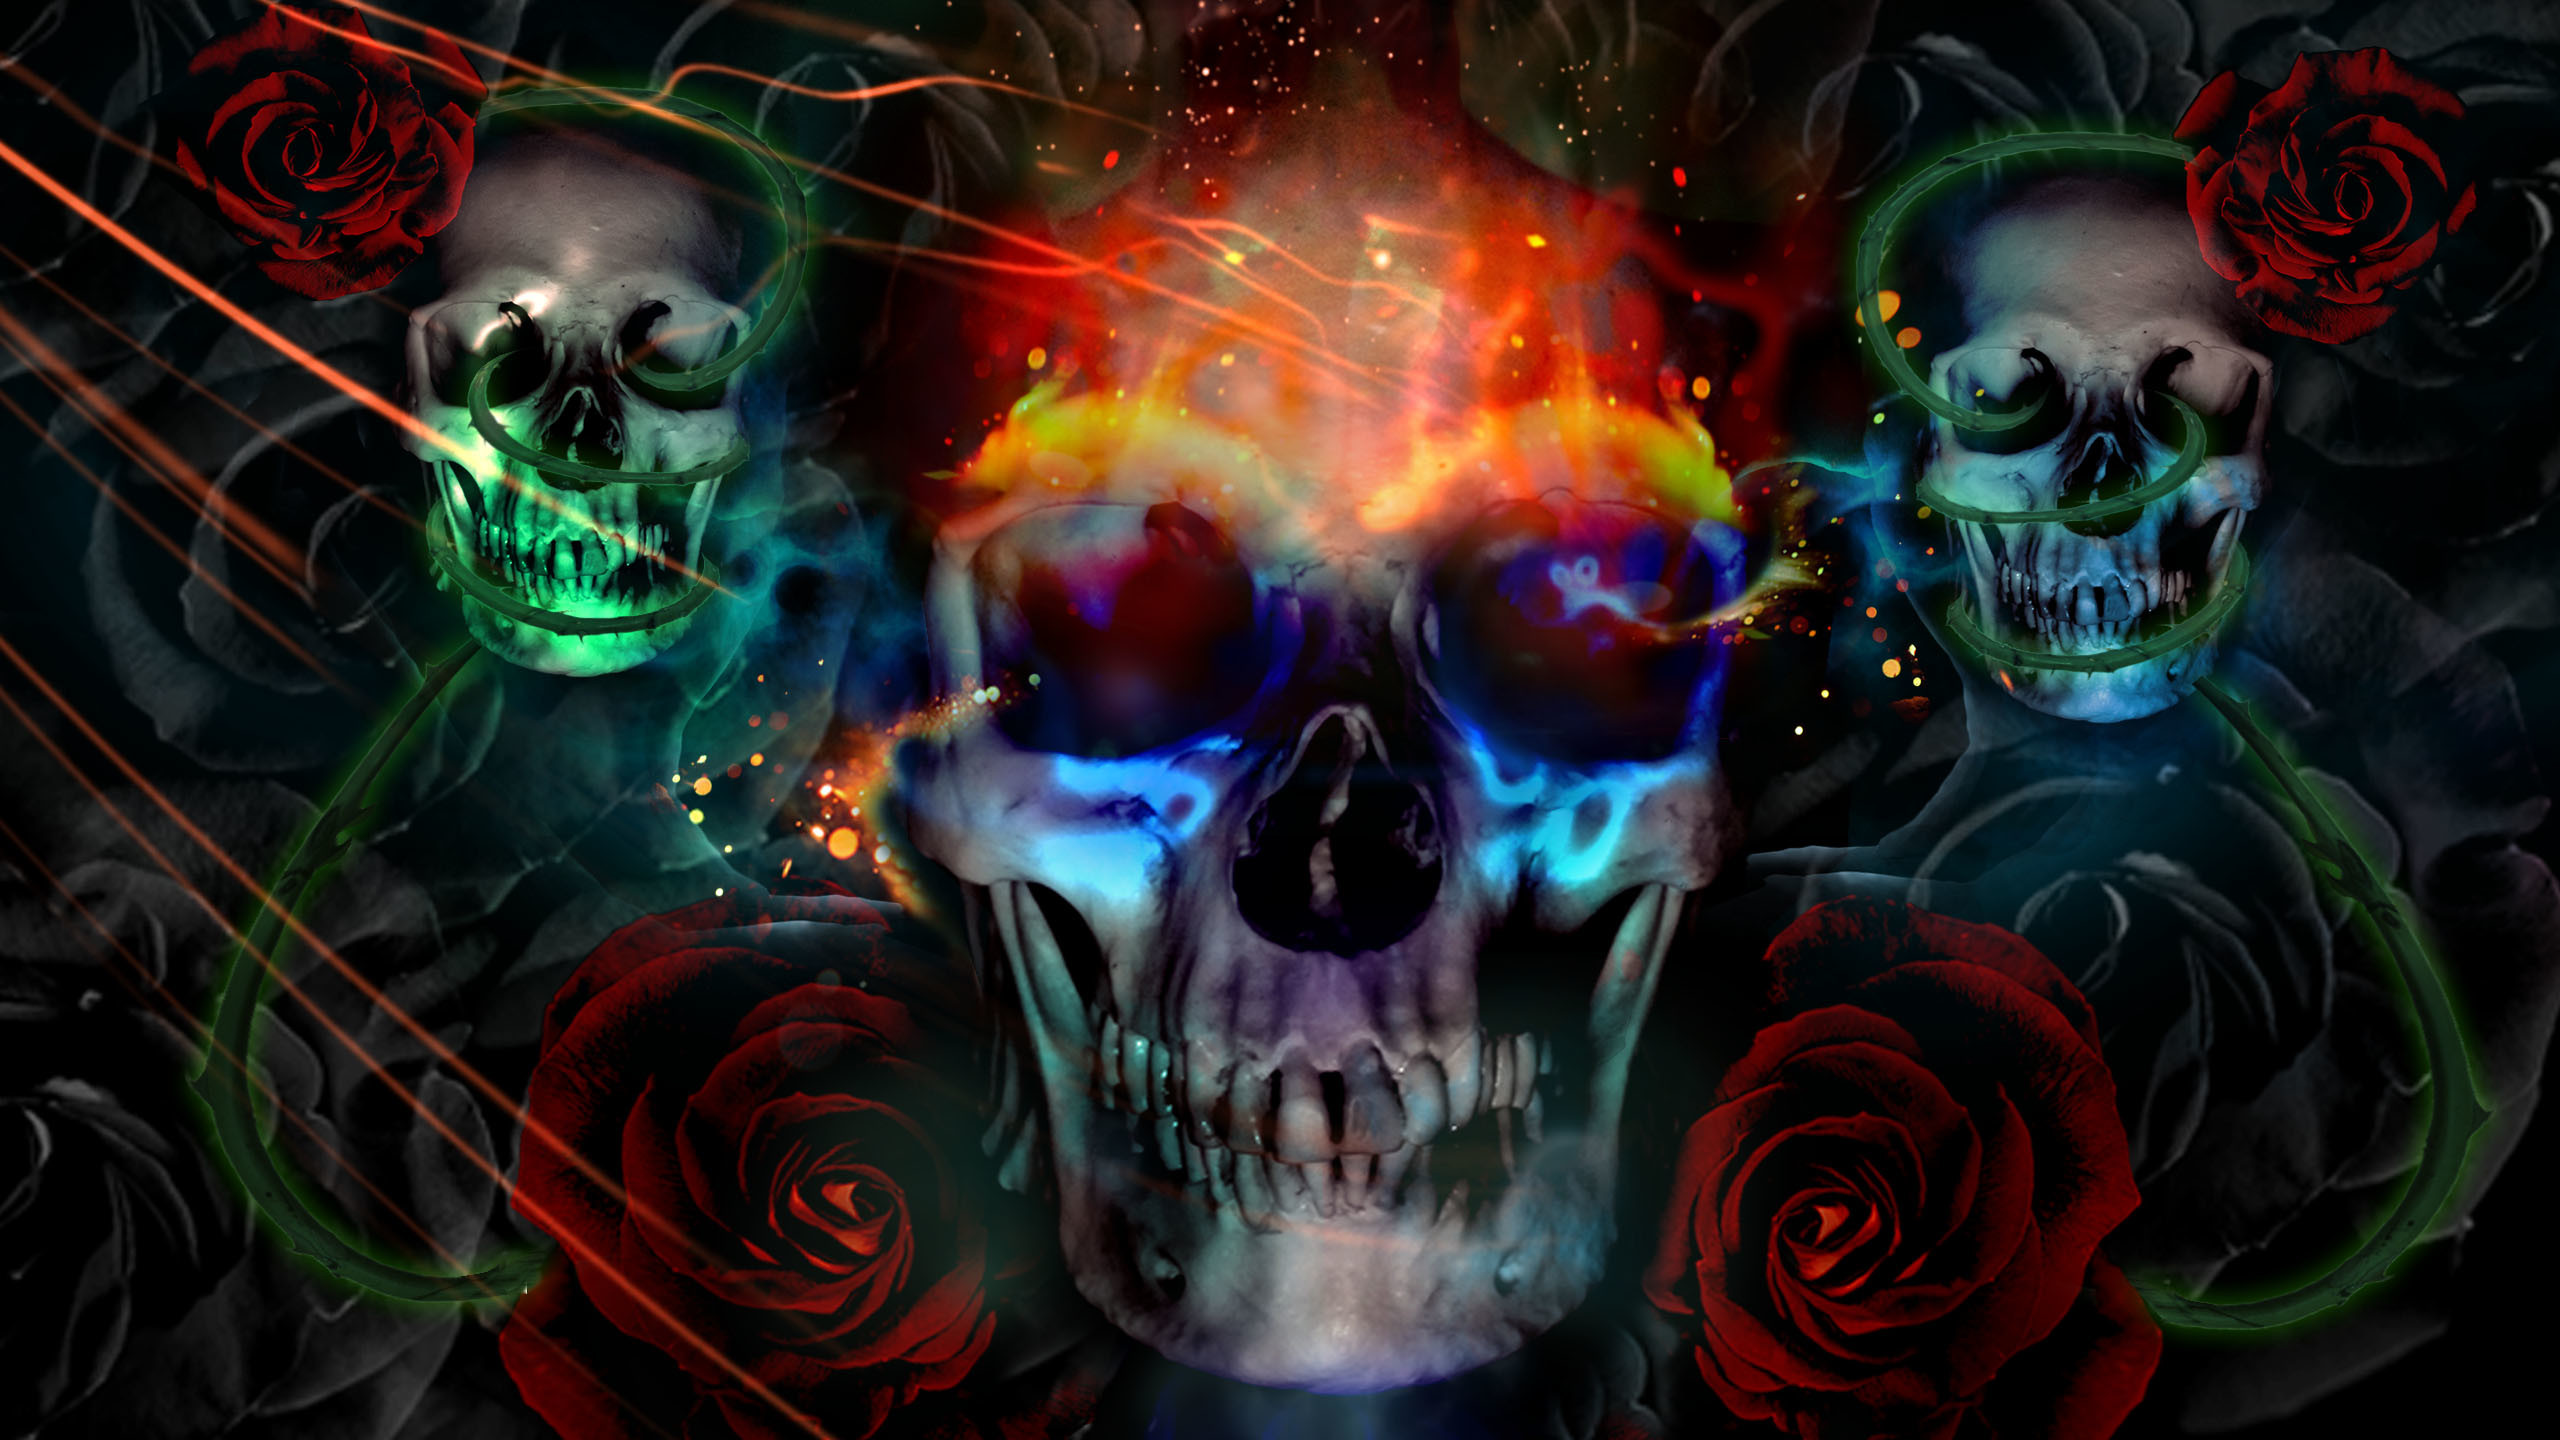 wallpaper, skulls desktop background hd wallpaper, background desktop .